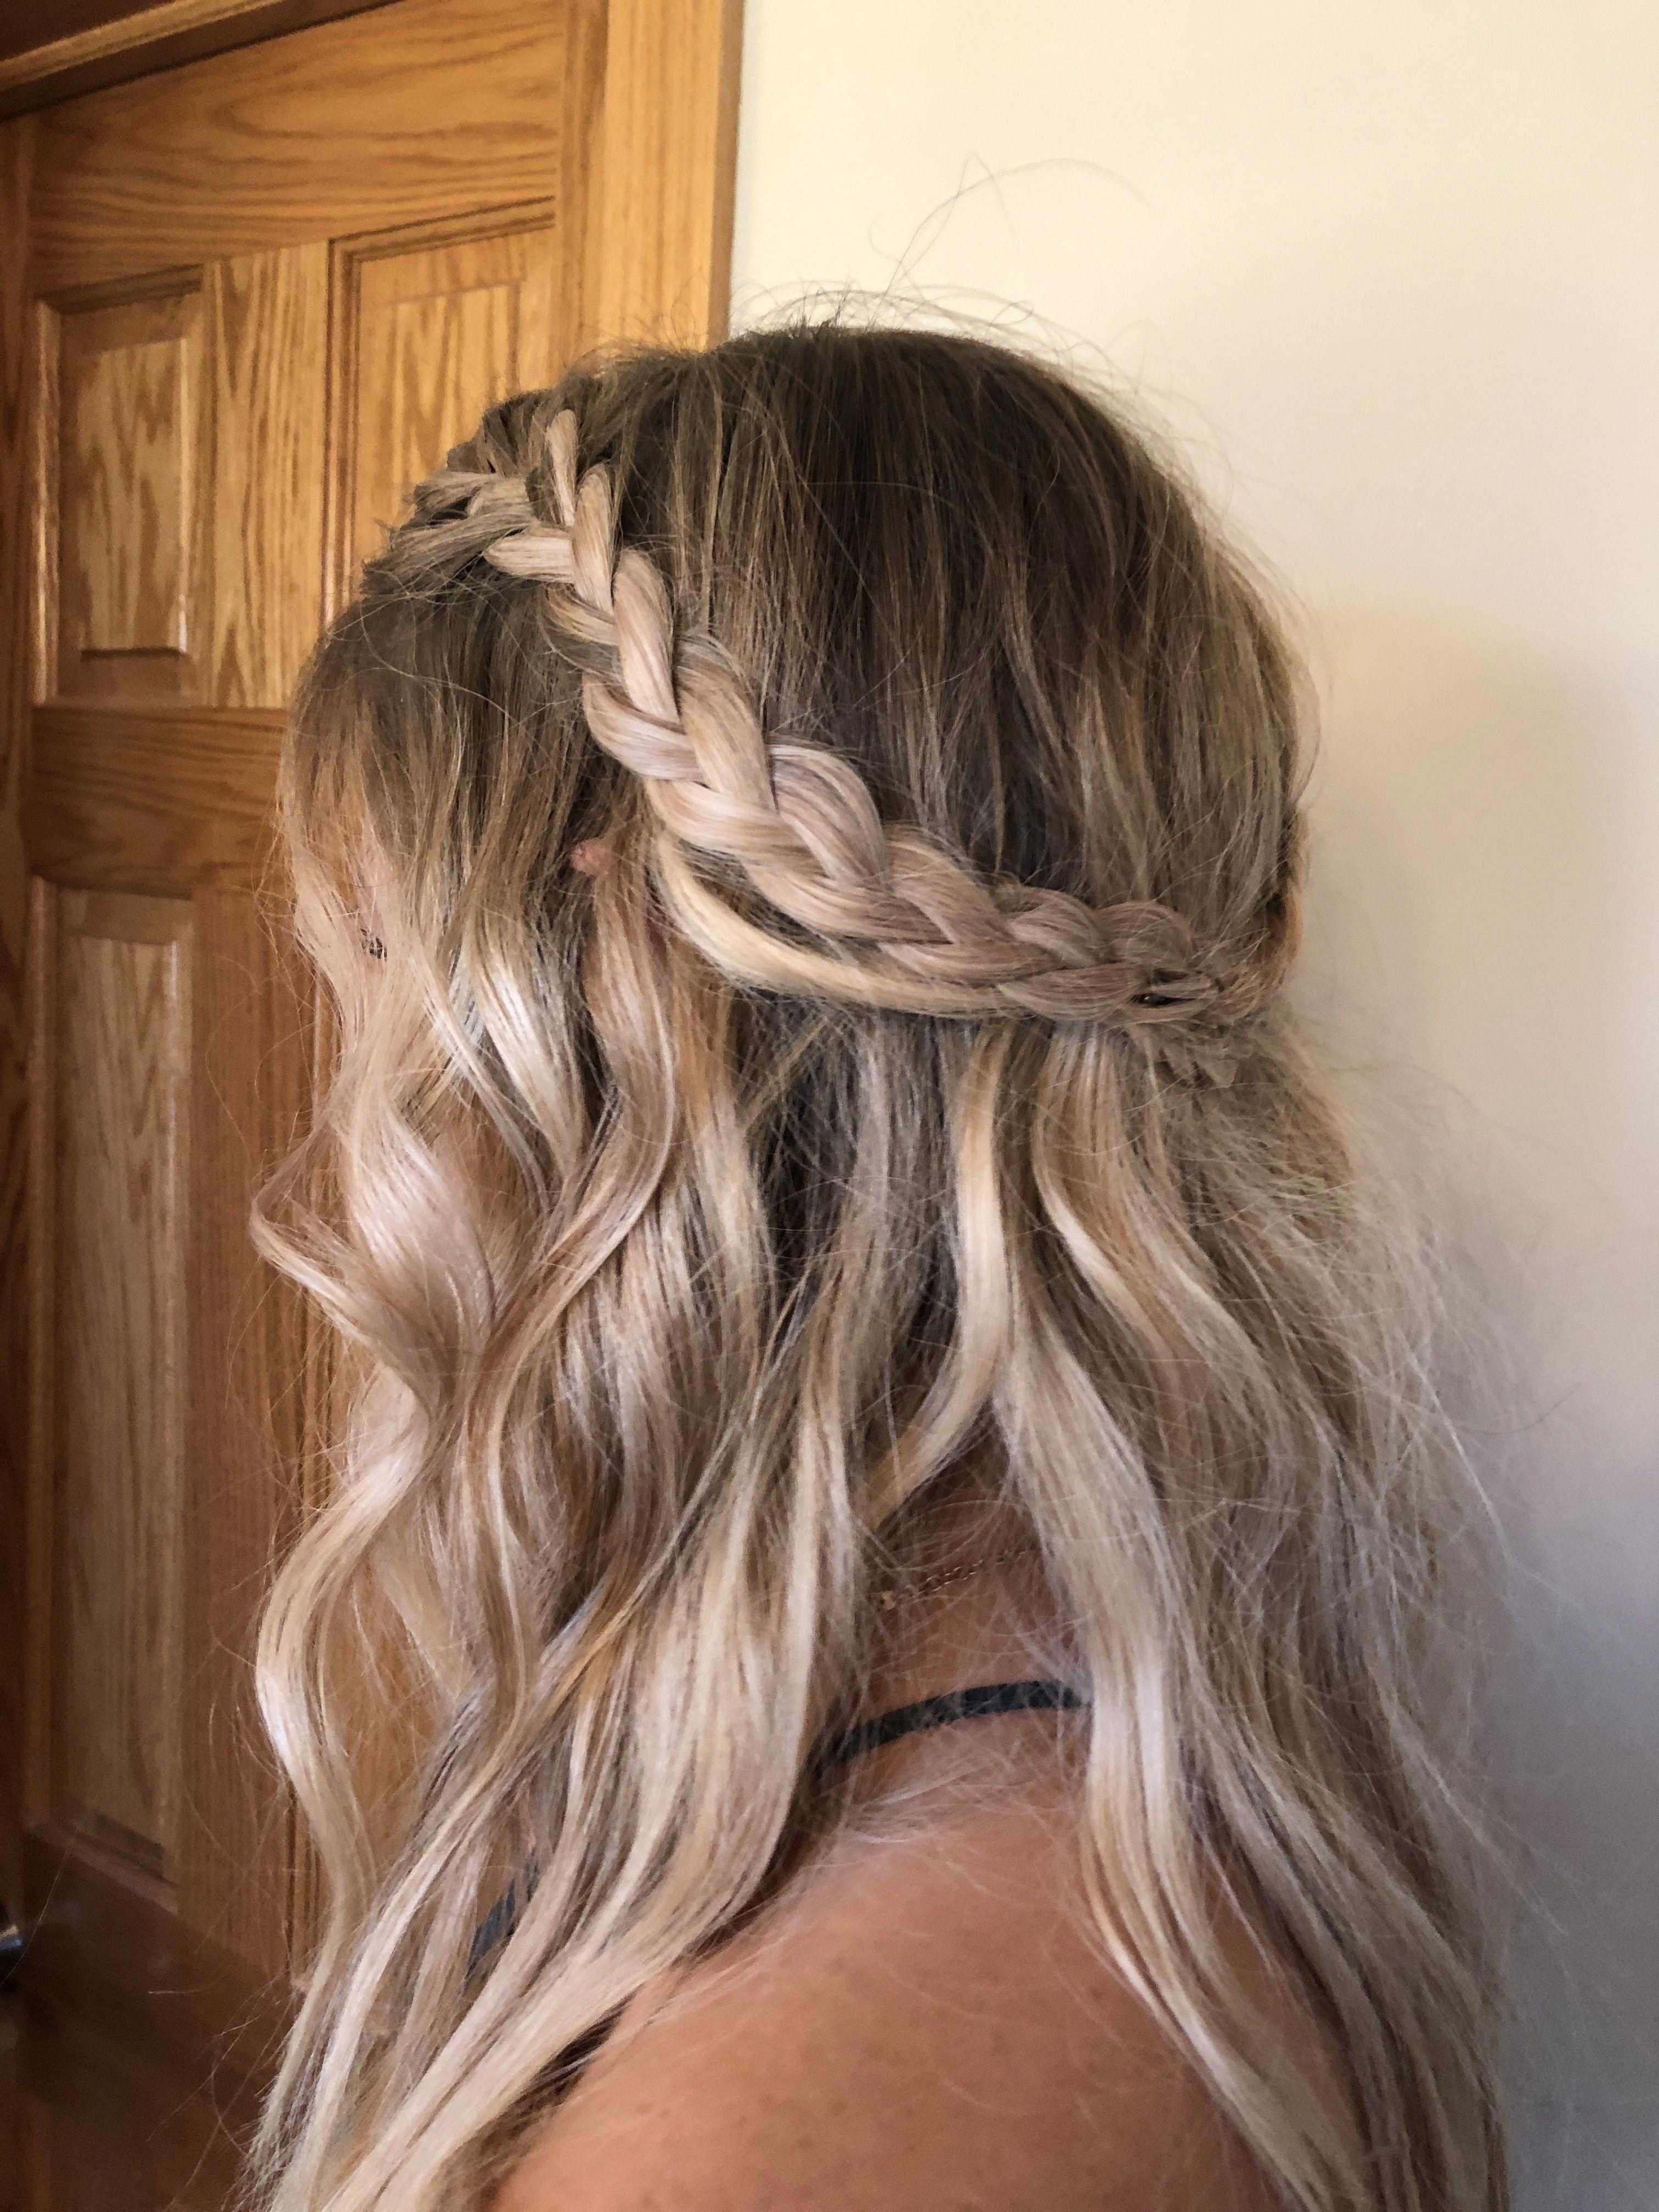 Braided Half Up Half Down Hairstyle Updospromhairstyles Wedding Hair Down Prom Hair Down Ball Hairstyles